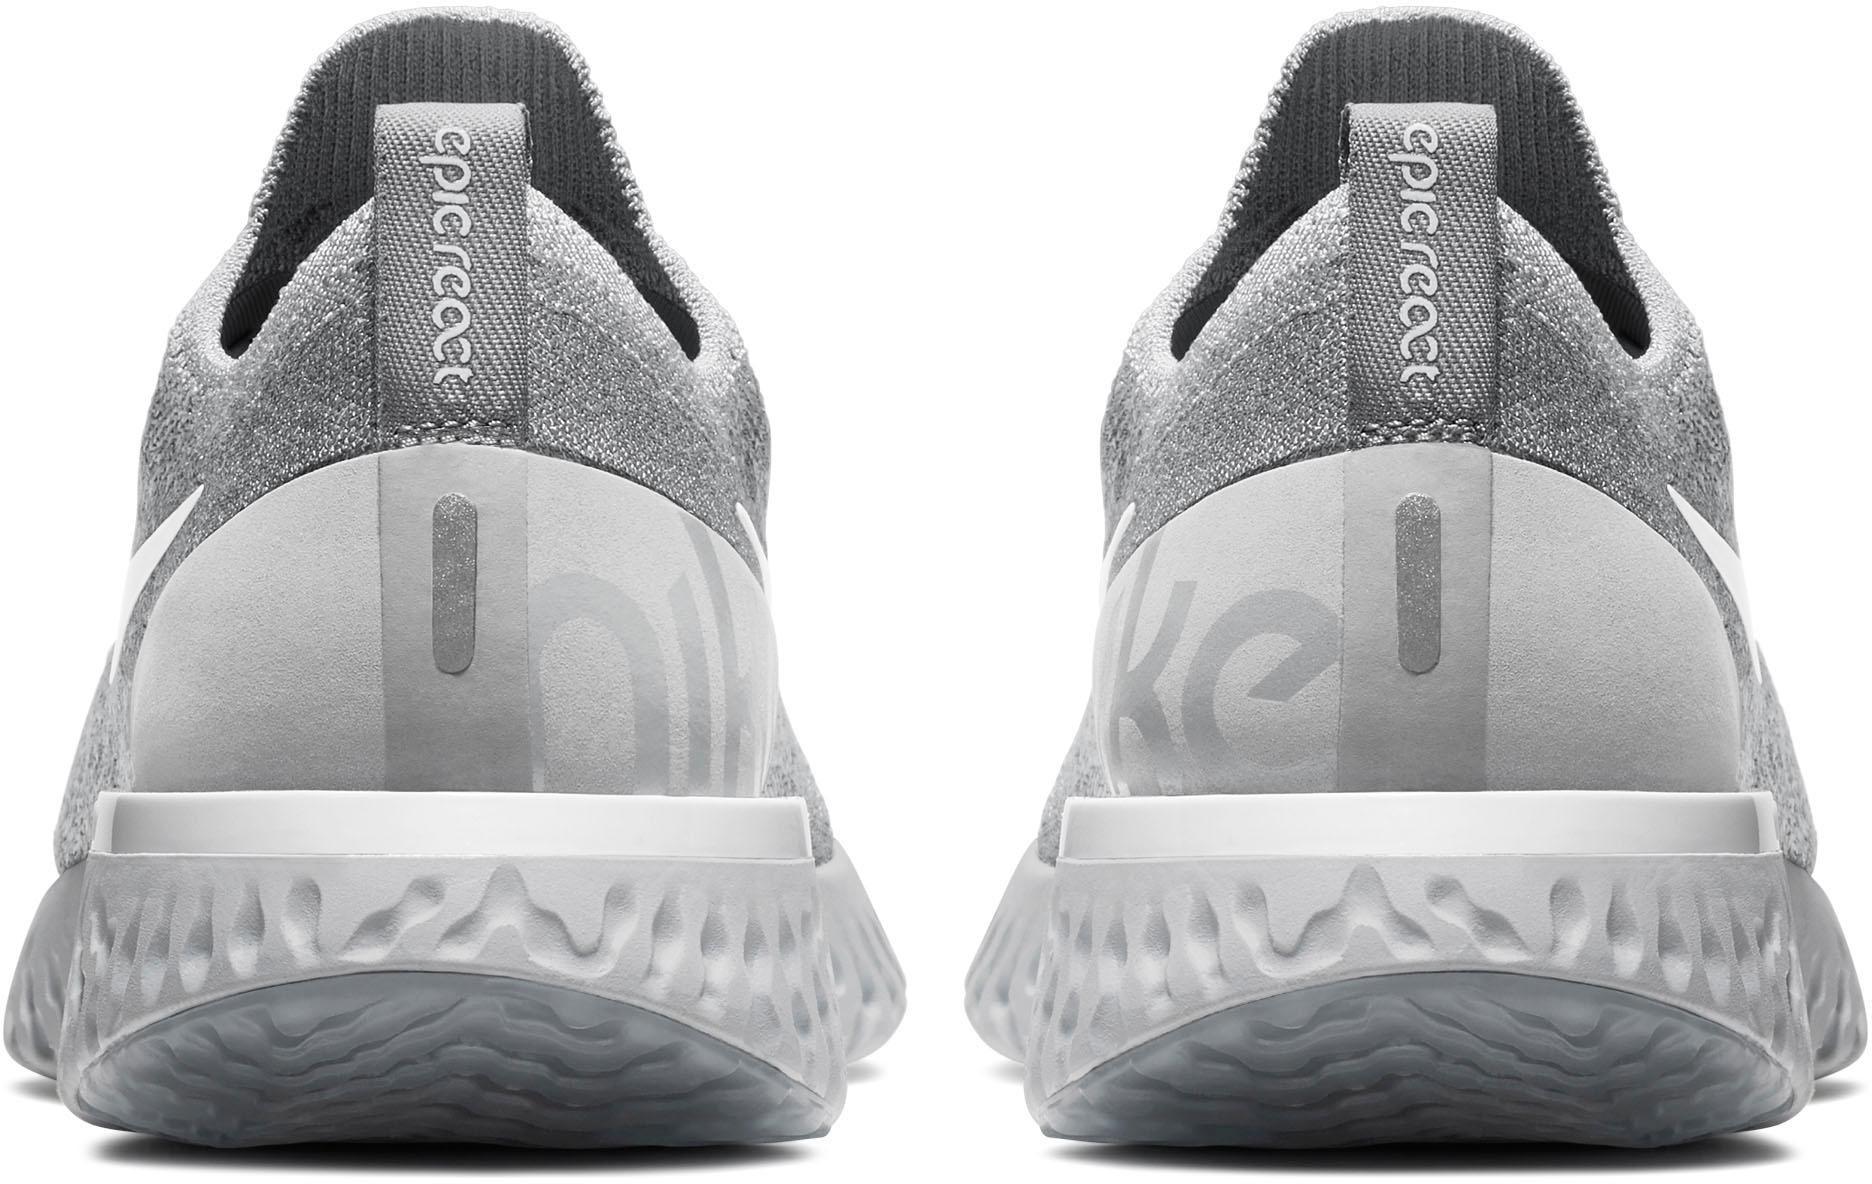 Nike Laufschuh    ;Wmns Epic React Flyknit für Damen bei Imwalking 9b84b6